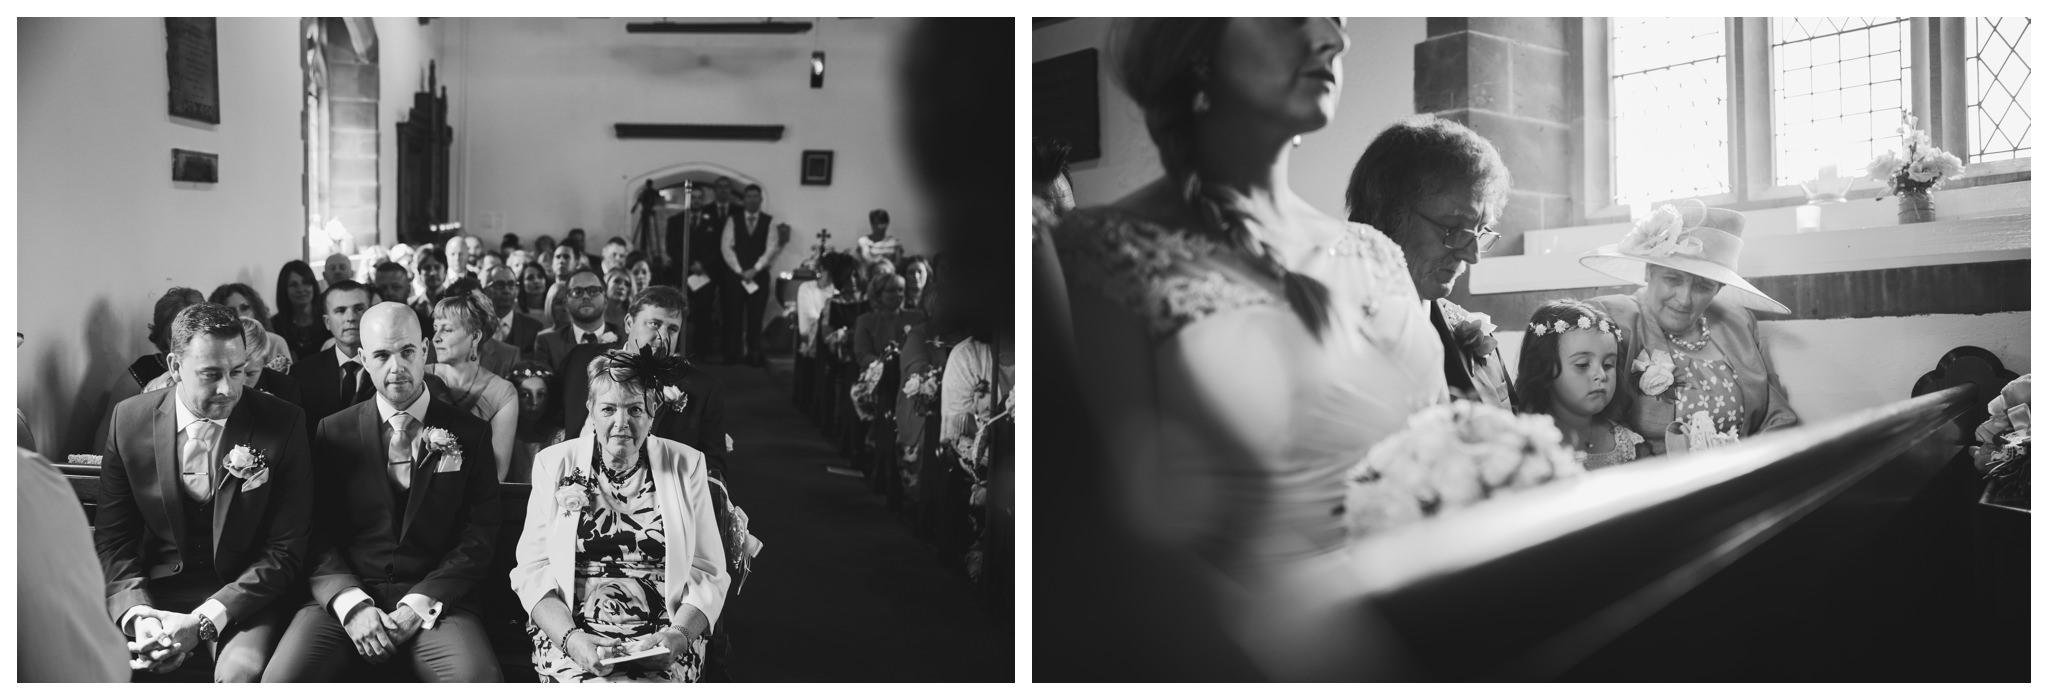 Richard Savage Photography - Wedding - Peterstone Court Brecon - 2016-05-11_0027